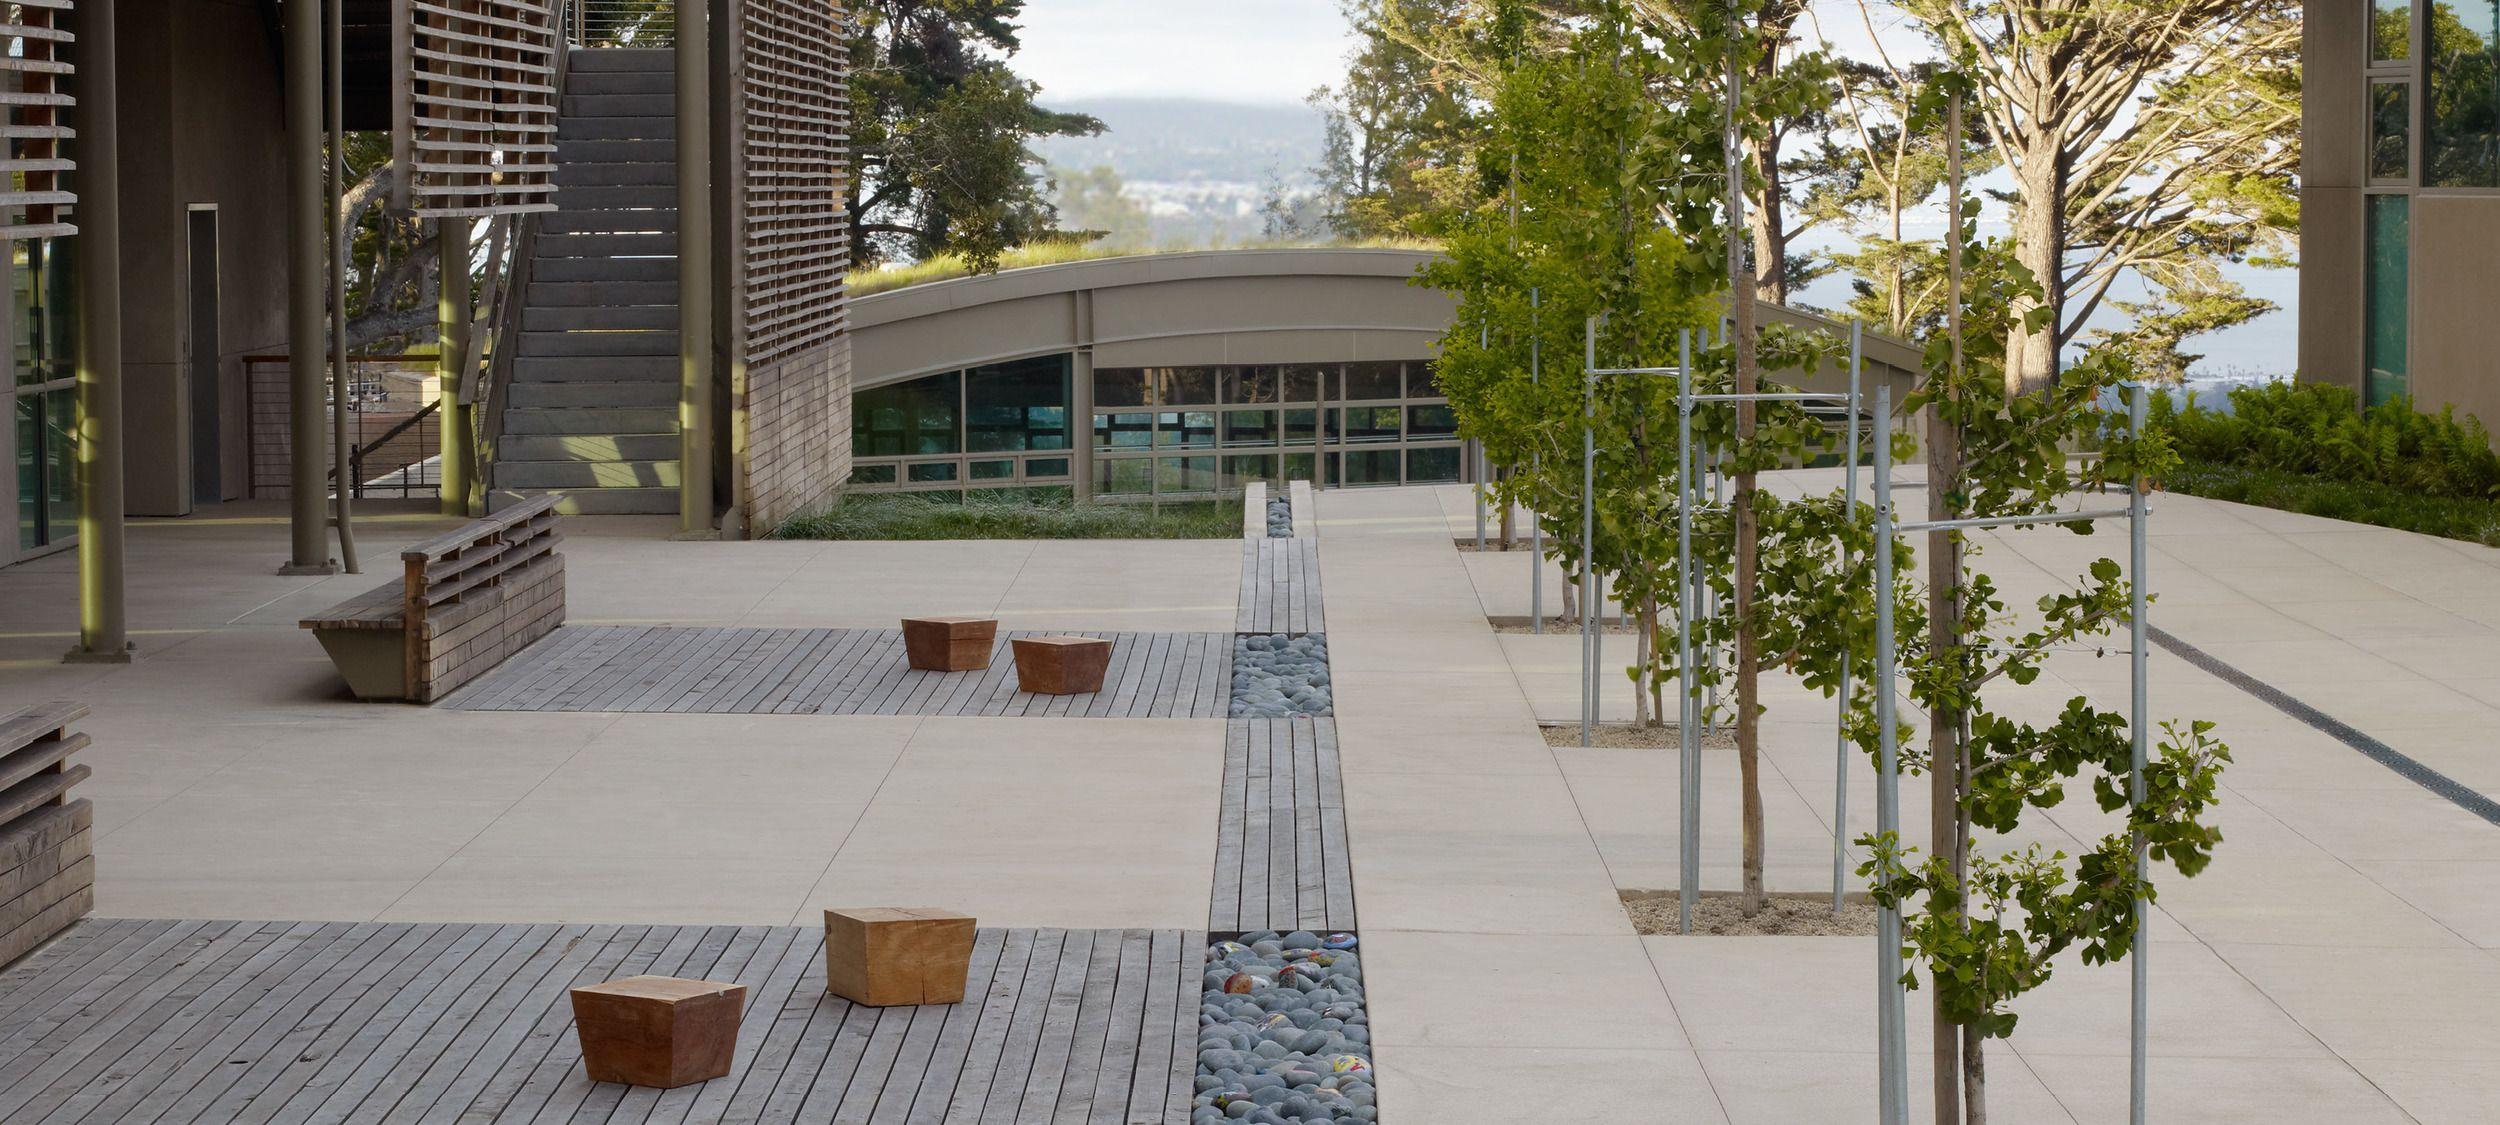 andrea cochran landscape architecture nueva school  outdoor classroom  stormwater runnel  plaza